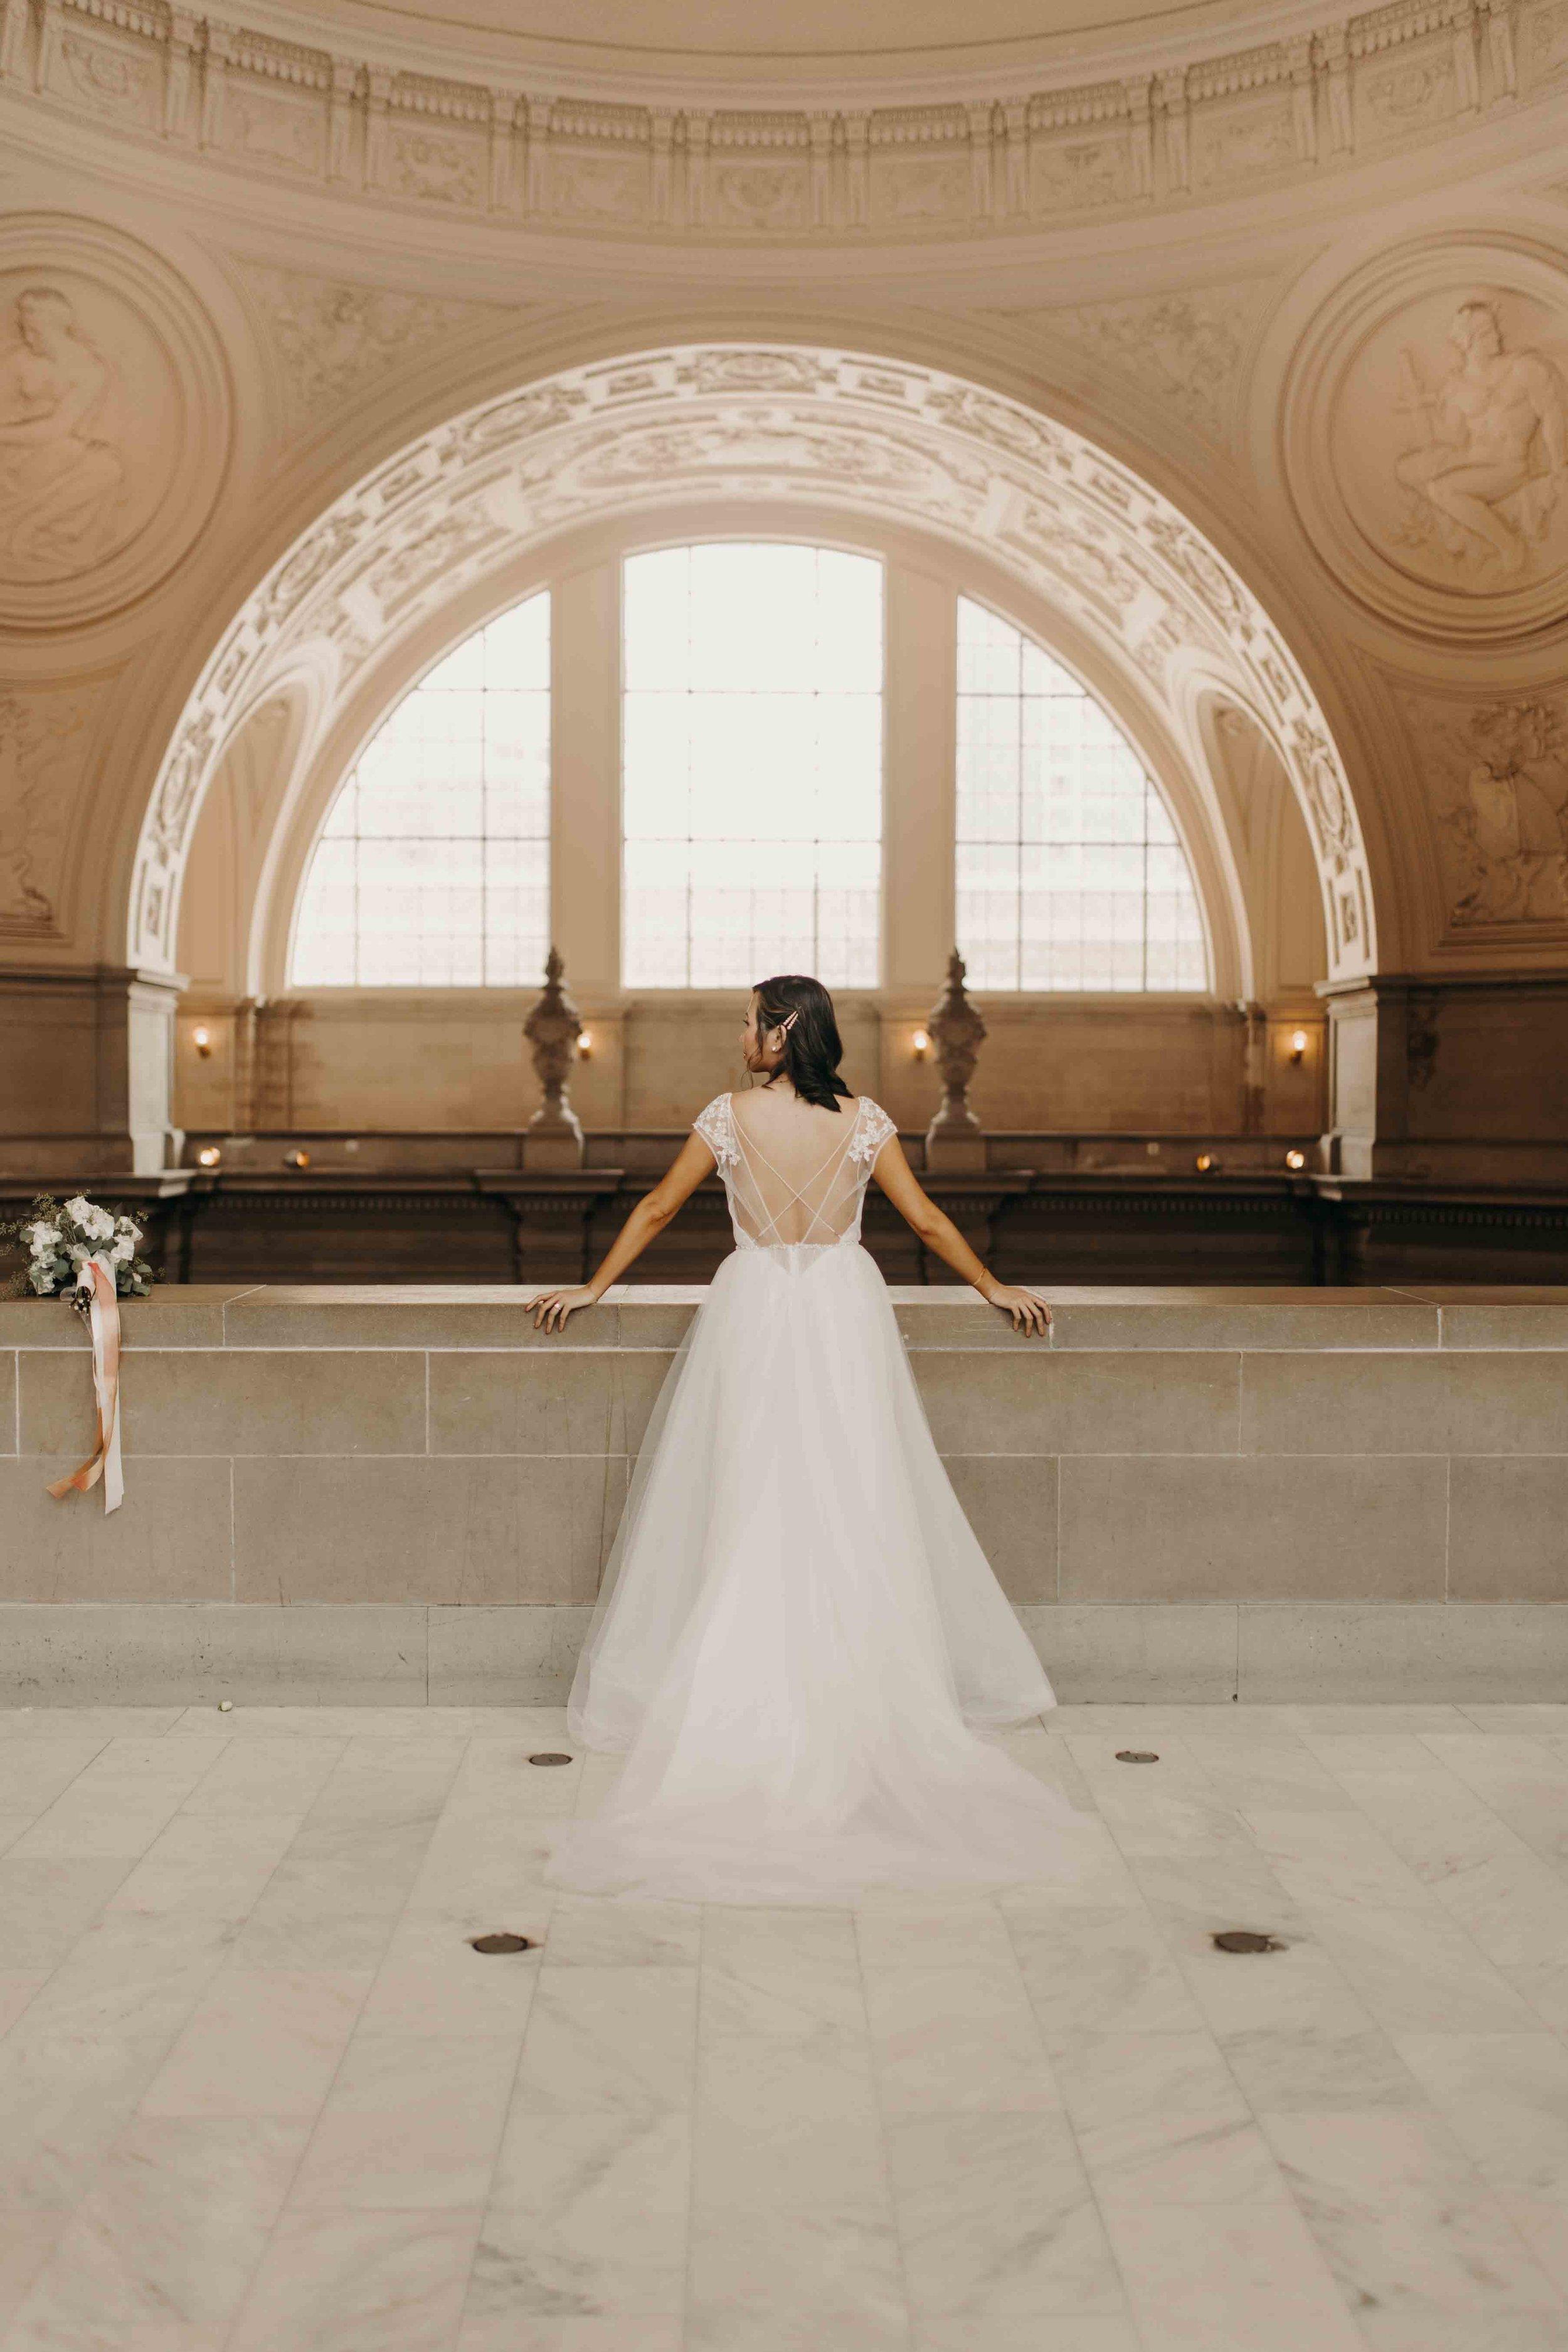 weddingday (30 of 67).jpg